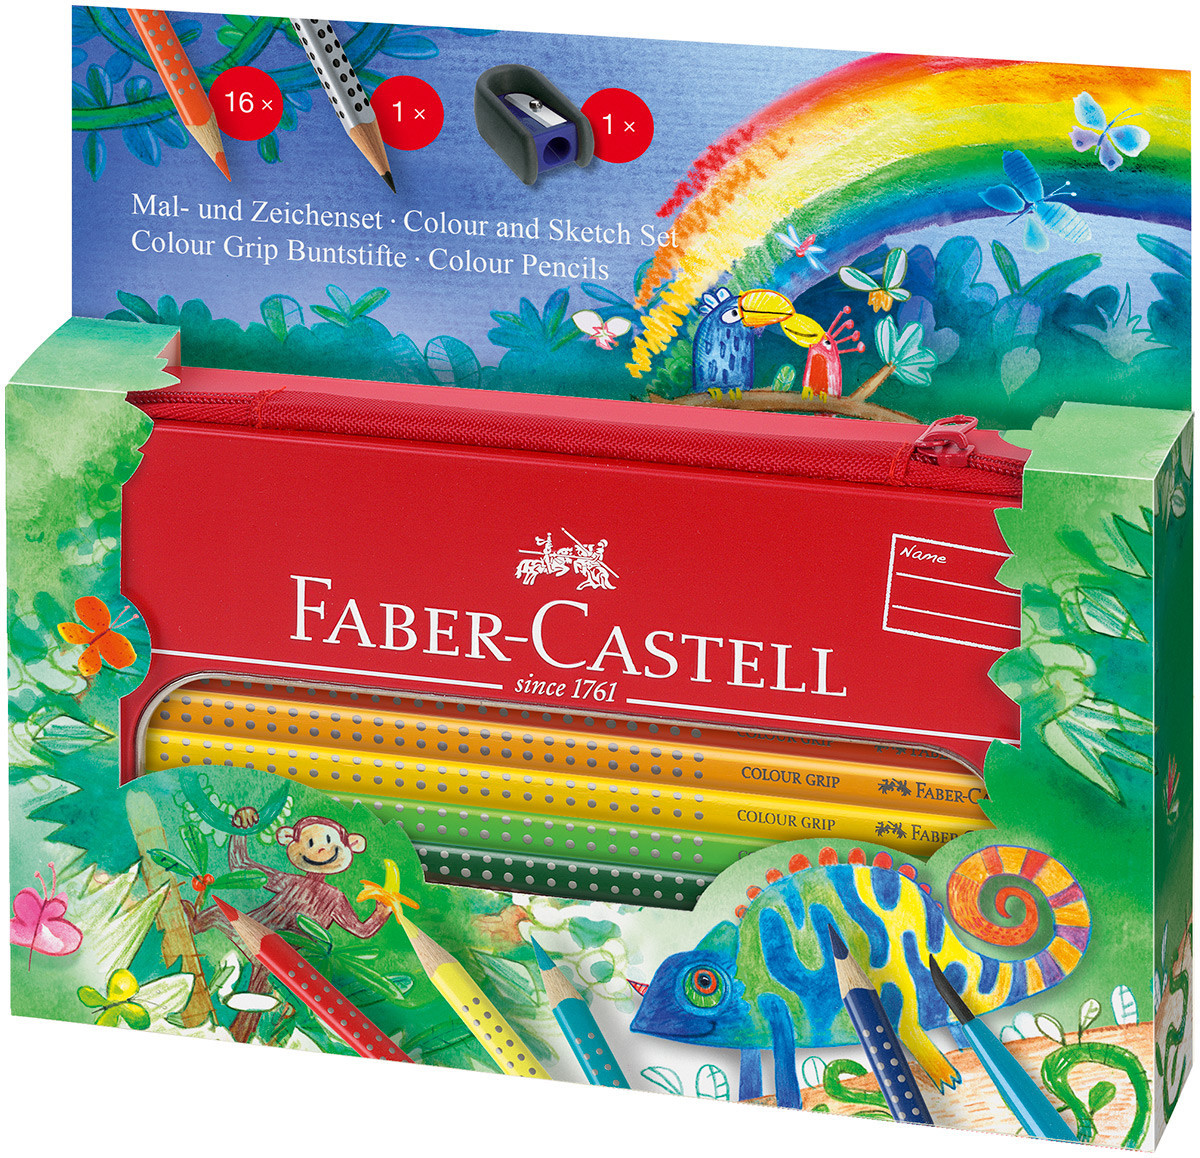 Faber-Castell Colour Grip Pencils - Jungle Gift Set with Pencil Case